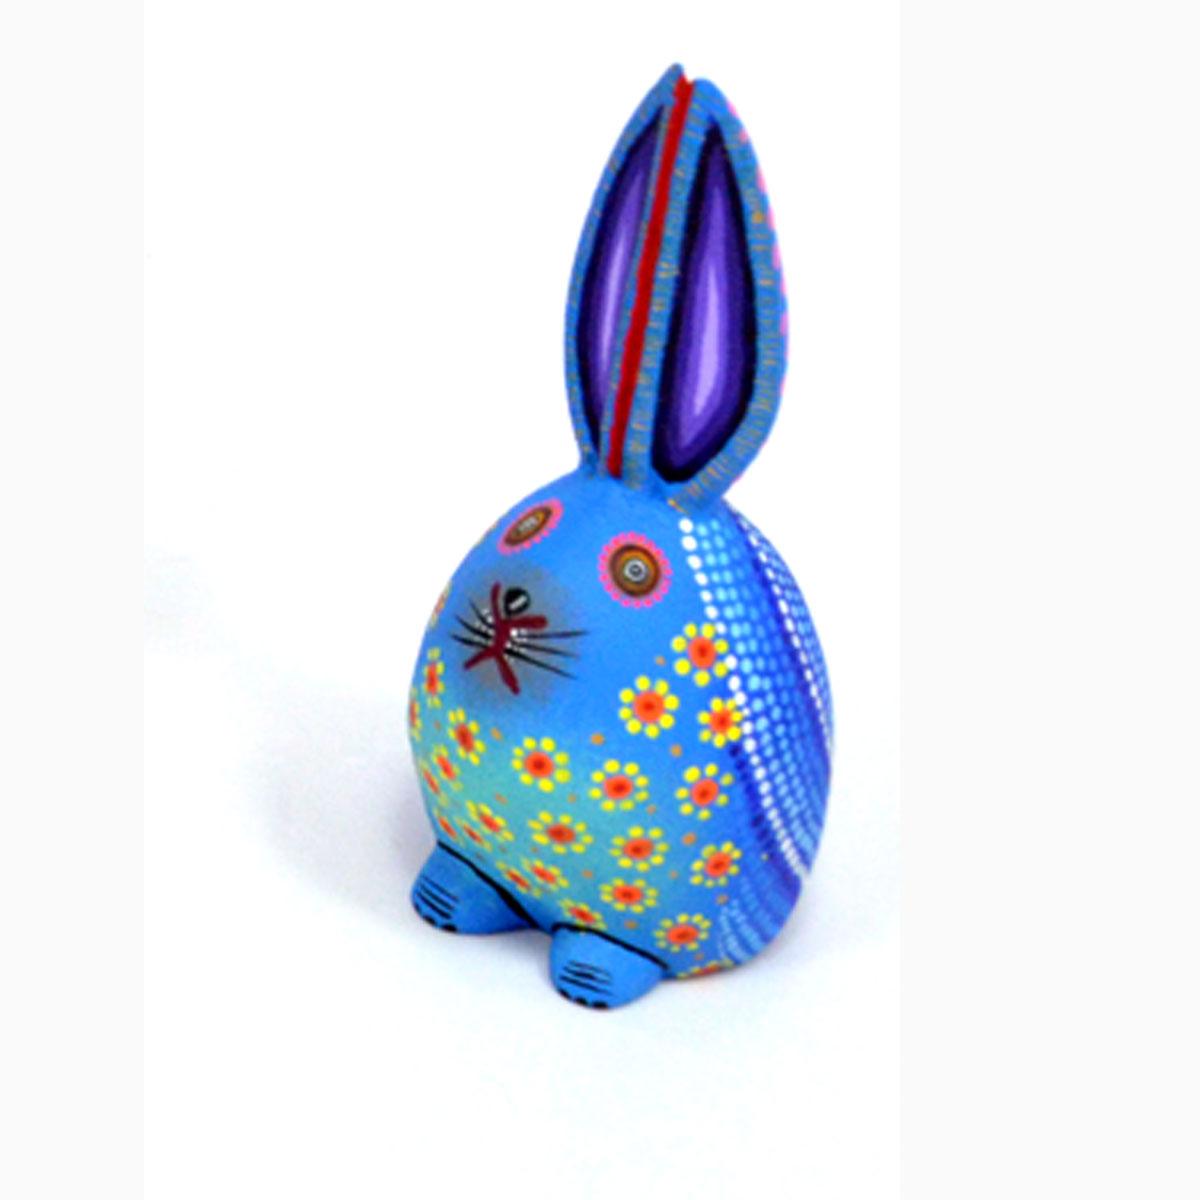 Jacobo and Maria Angeles Jacobo and Maria Angeles: Mini Rabbits Jacobo and Maria Angeles